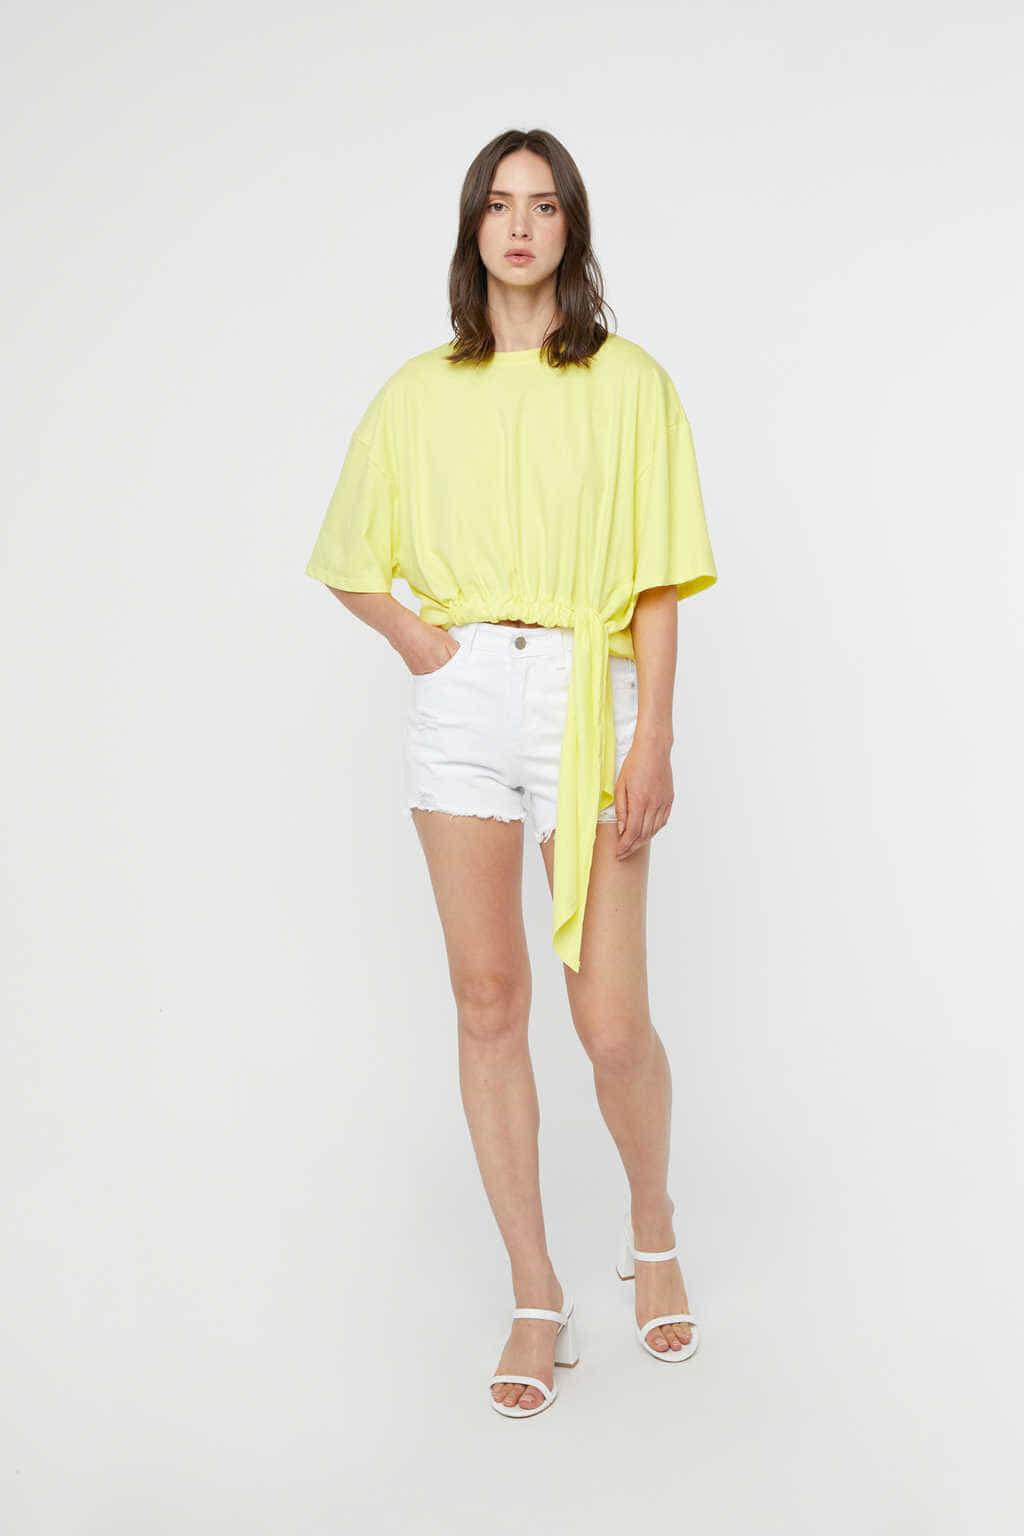 TShirt K151 Yellow 2